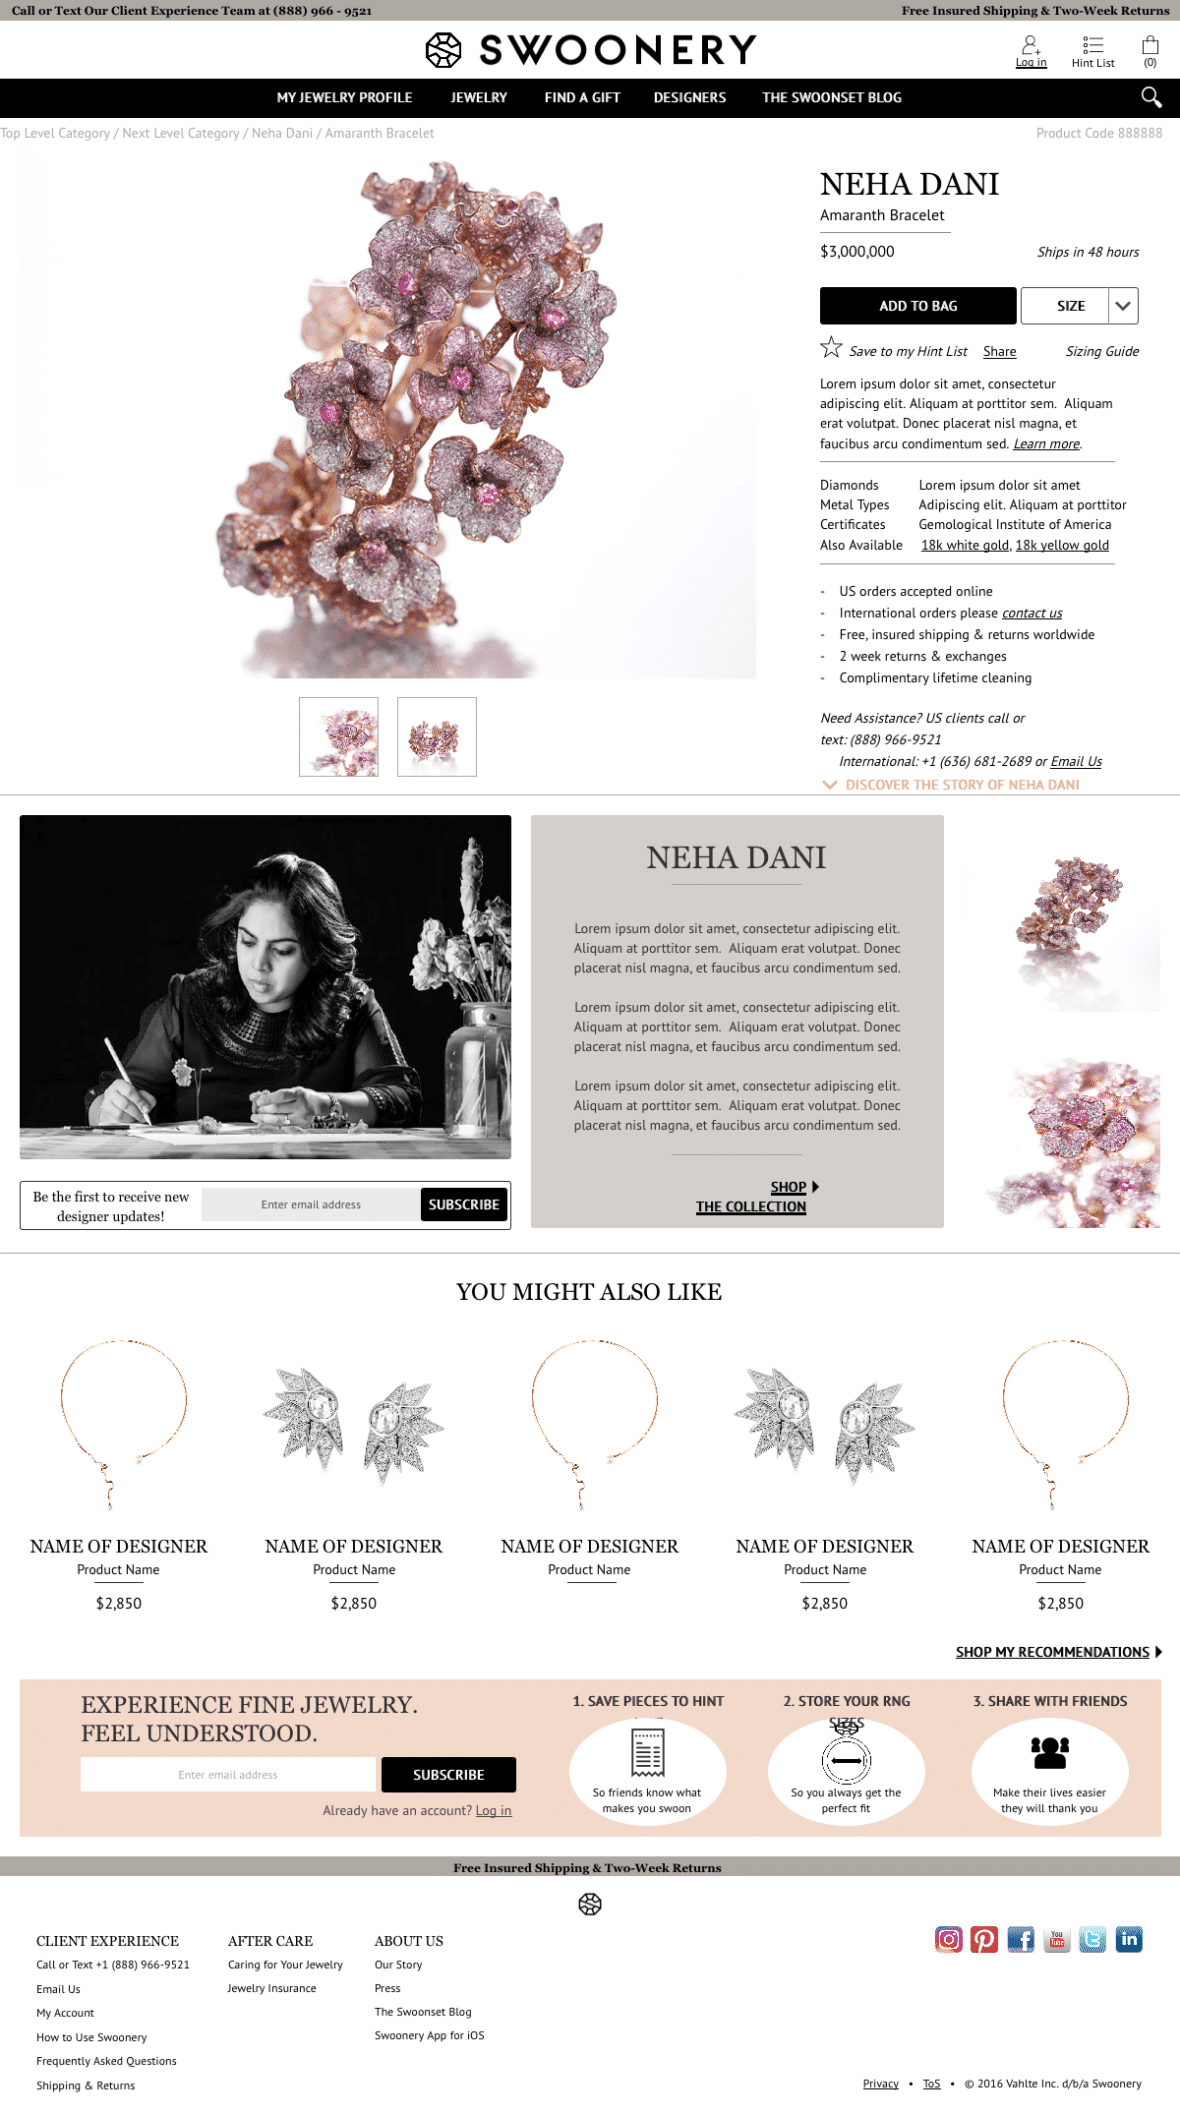 0-neha-dani-product-page-8-swoonery-web-56691893-1473856464